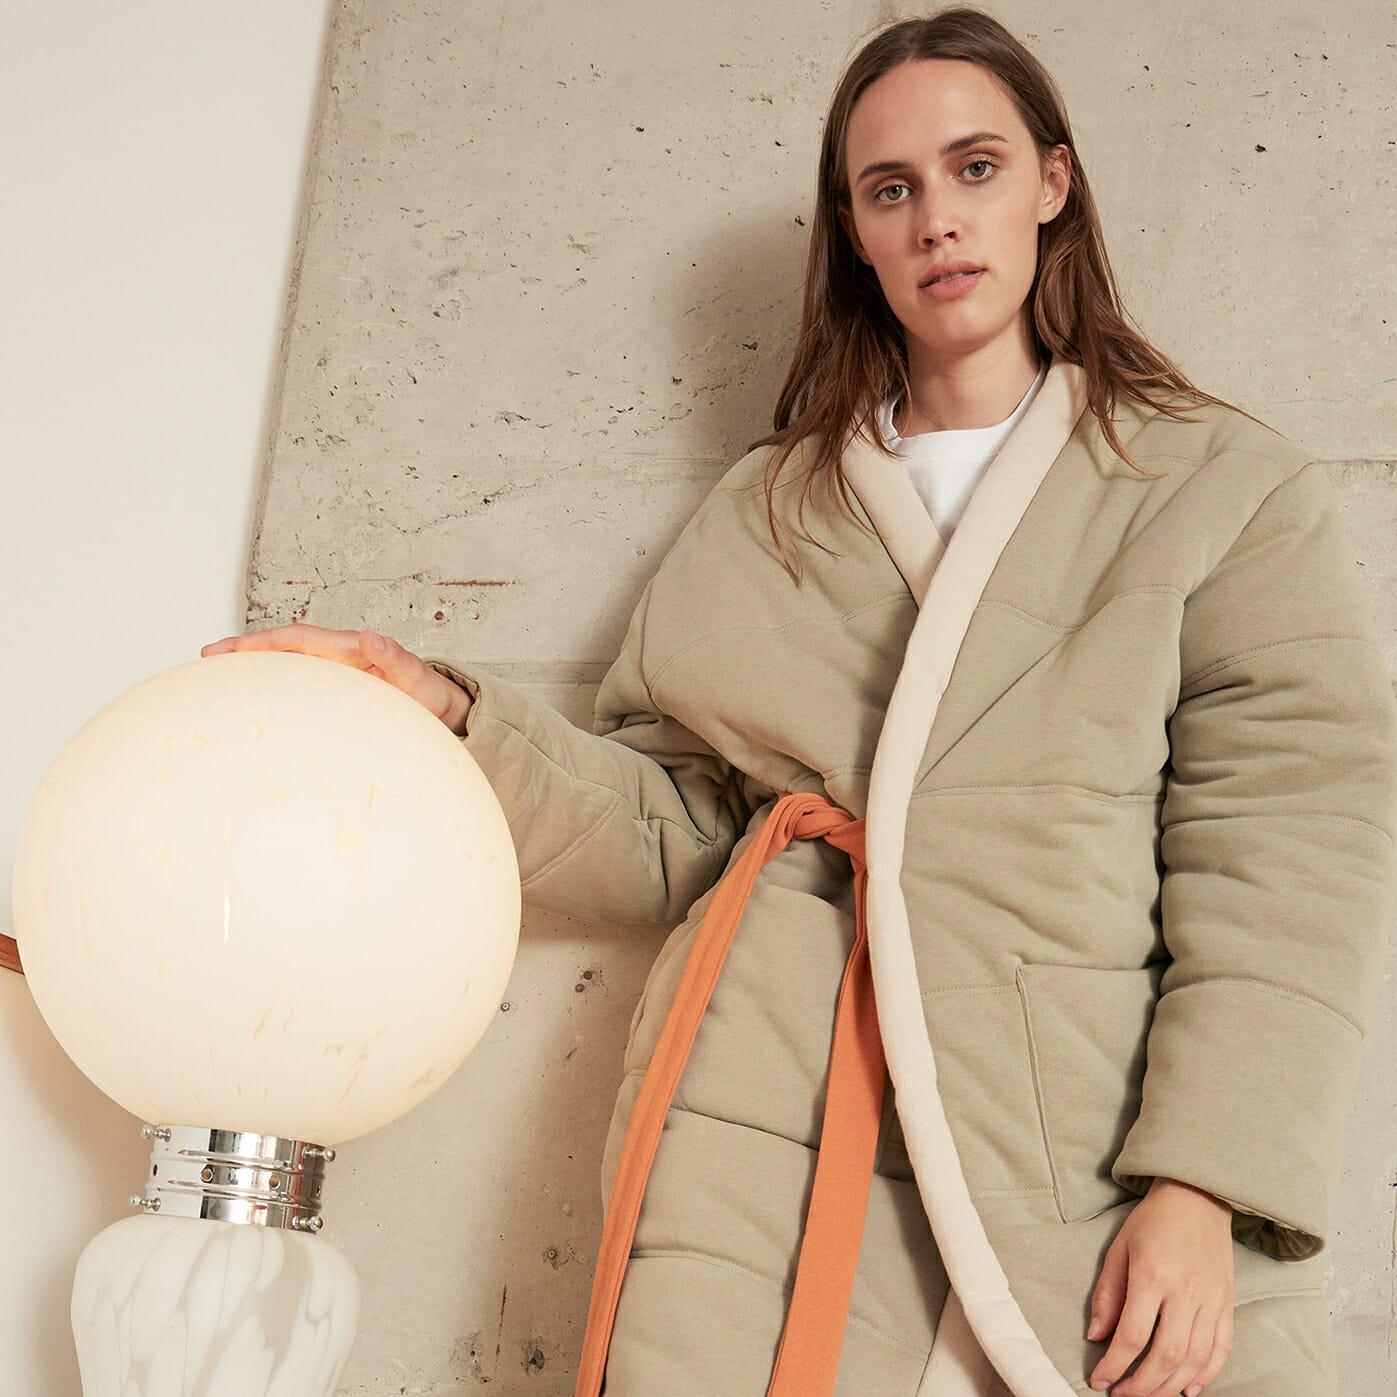 Duvet-coats-Offhours-Man-Repeller-January-2019-1-of-1-copy-2.jpg